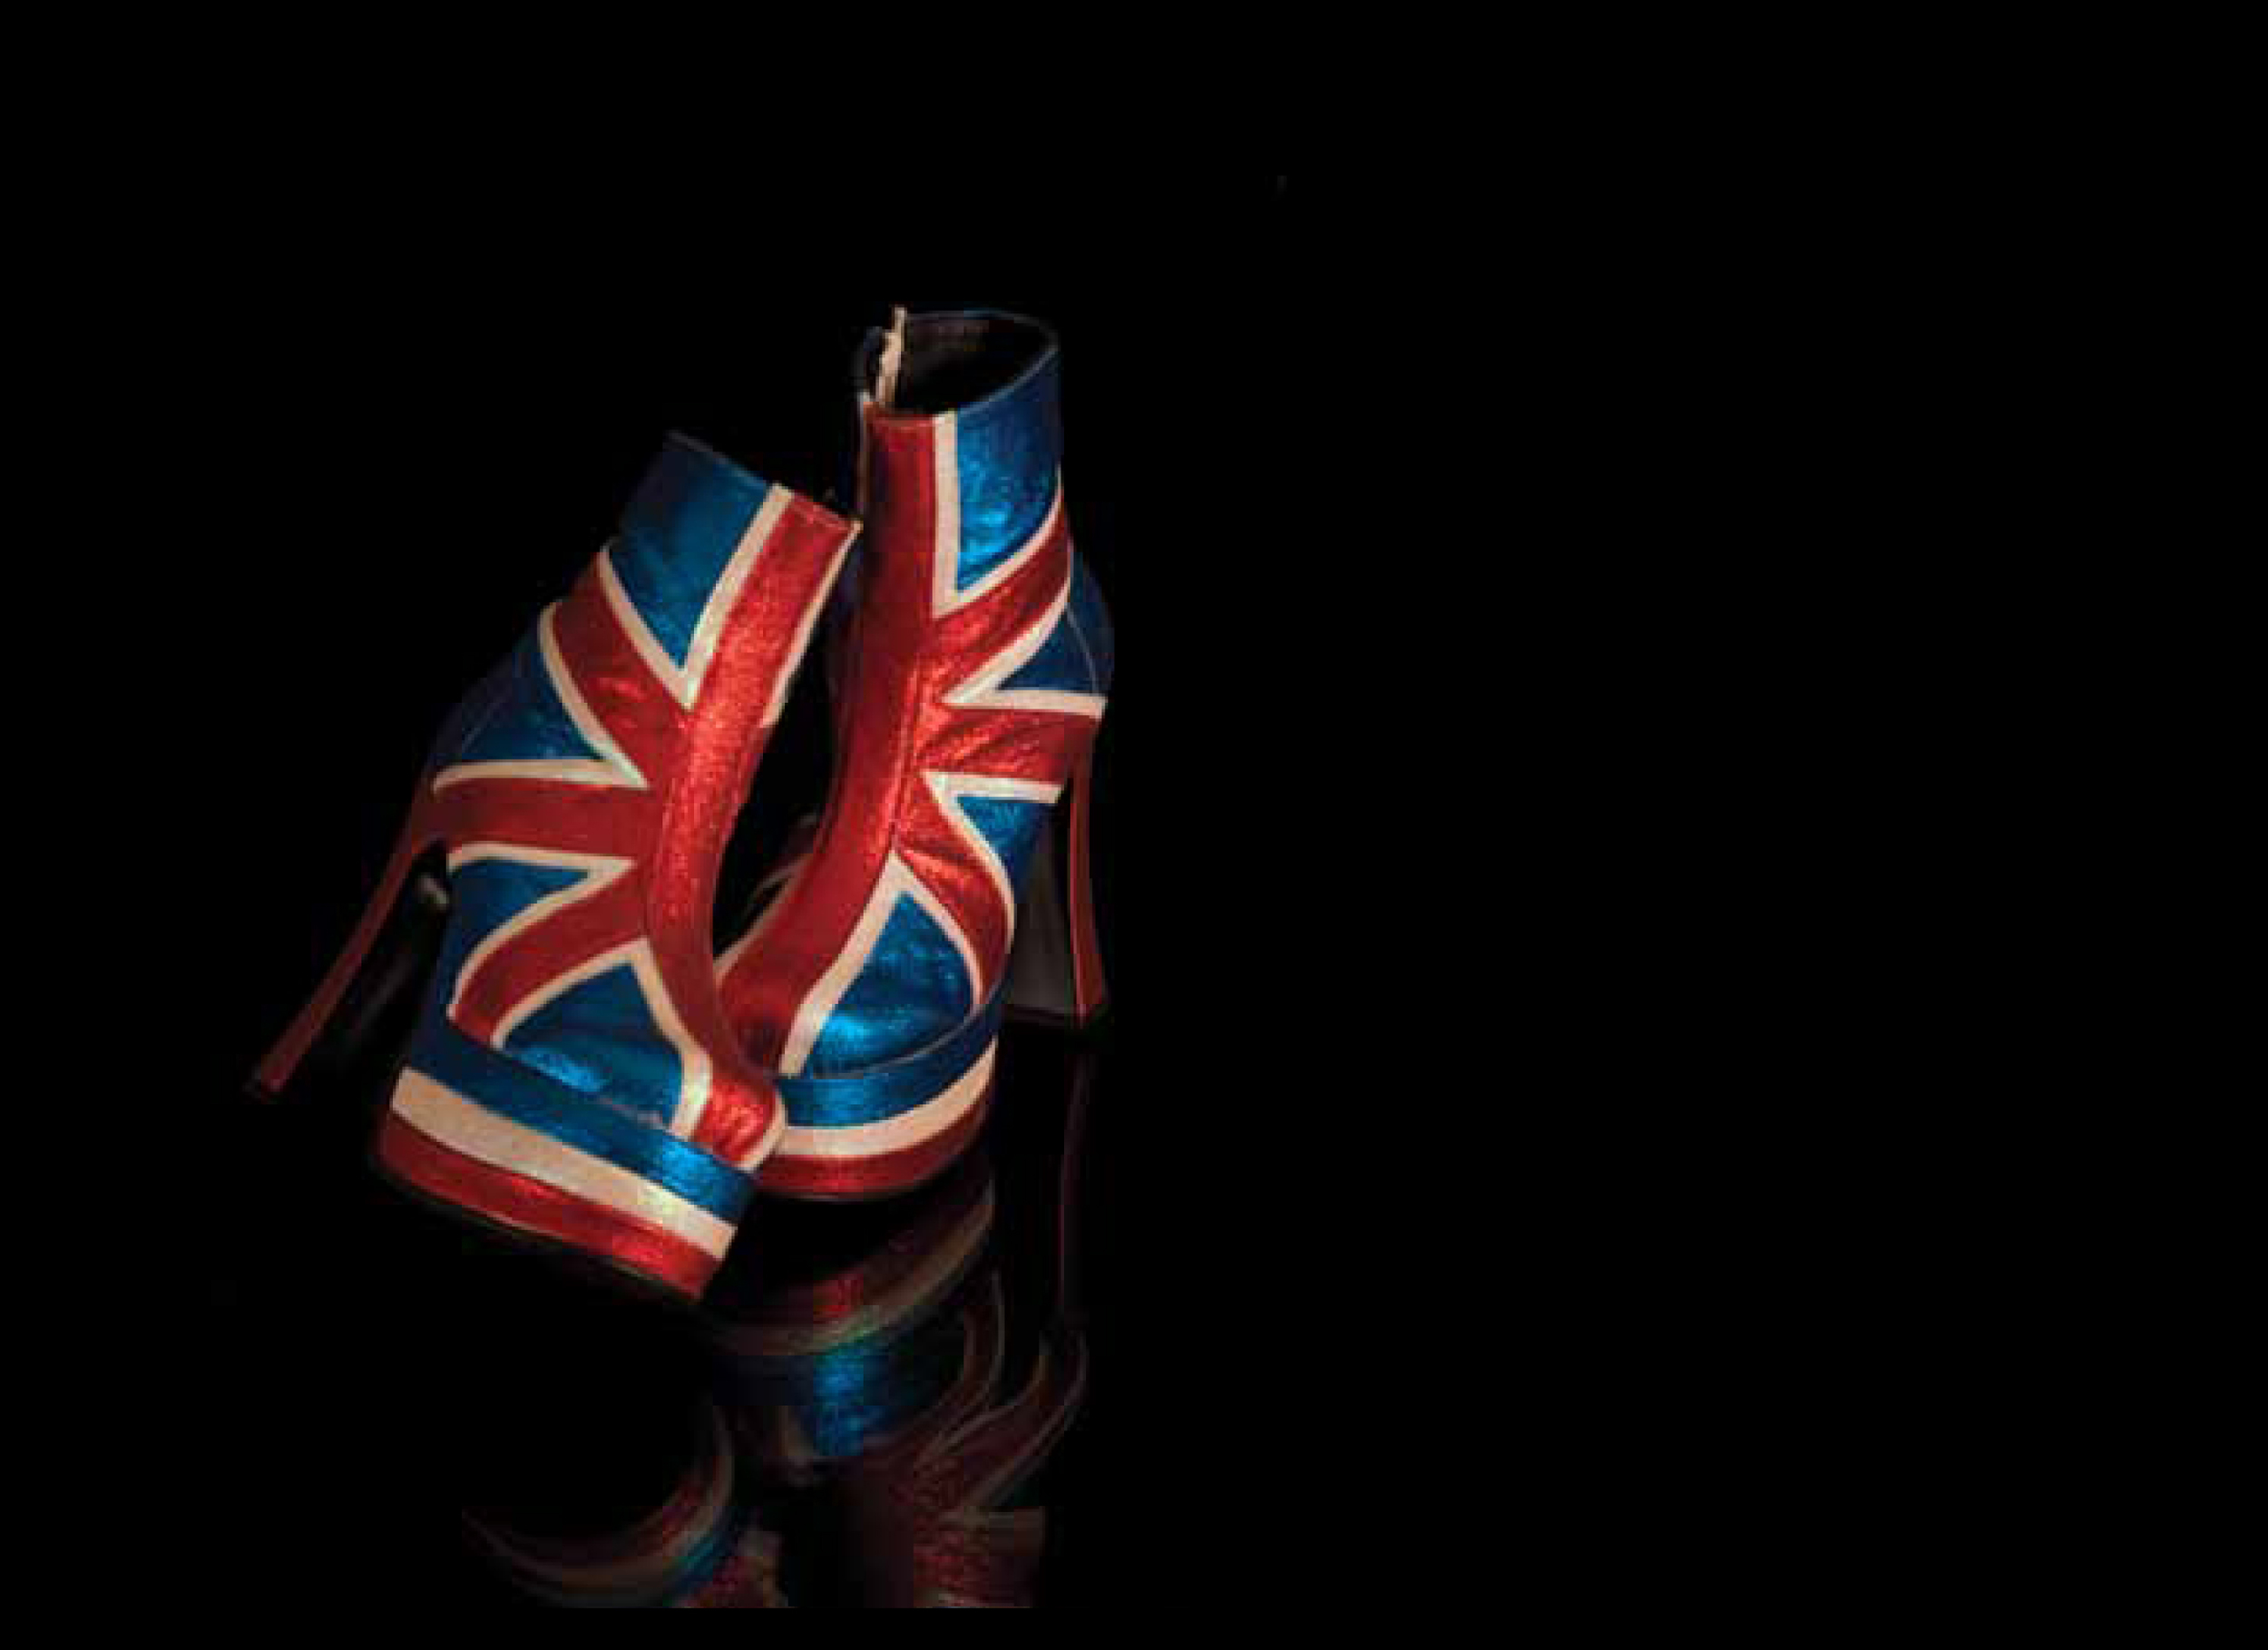 Image: Geri Halliwell, Istanbul, 1997. Union Jack platform ankle boots. Designed by Shelley's